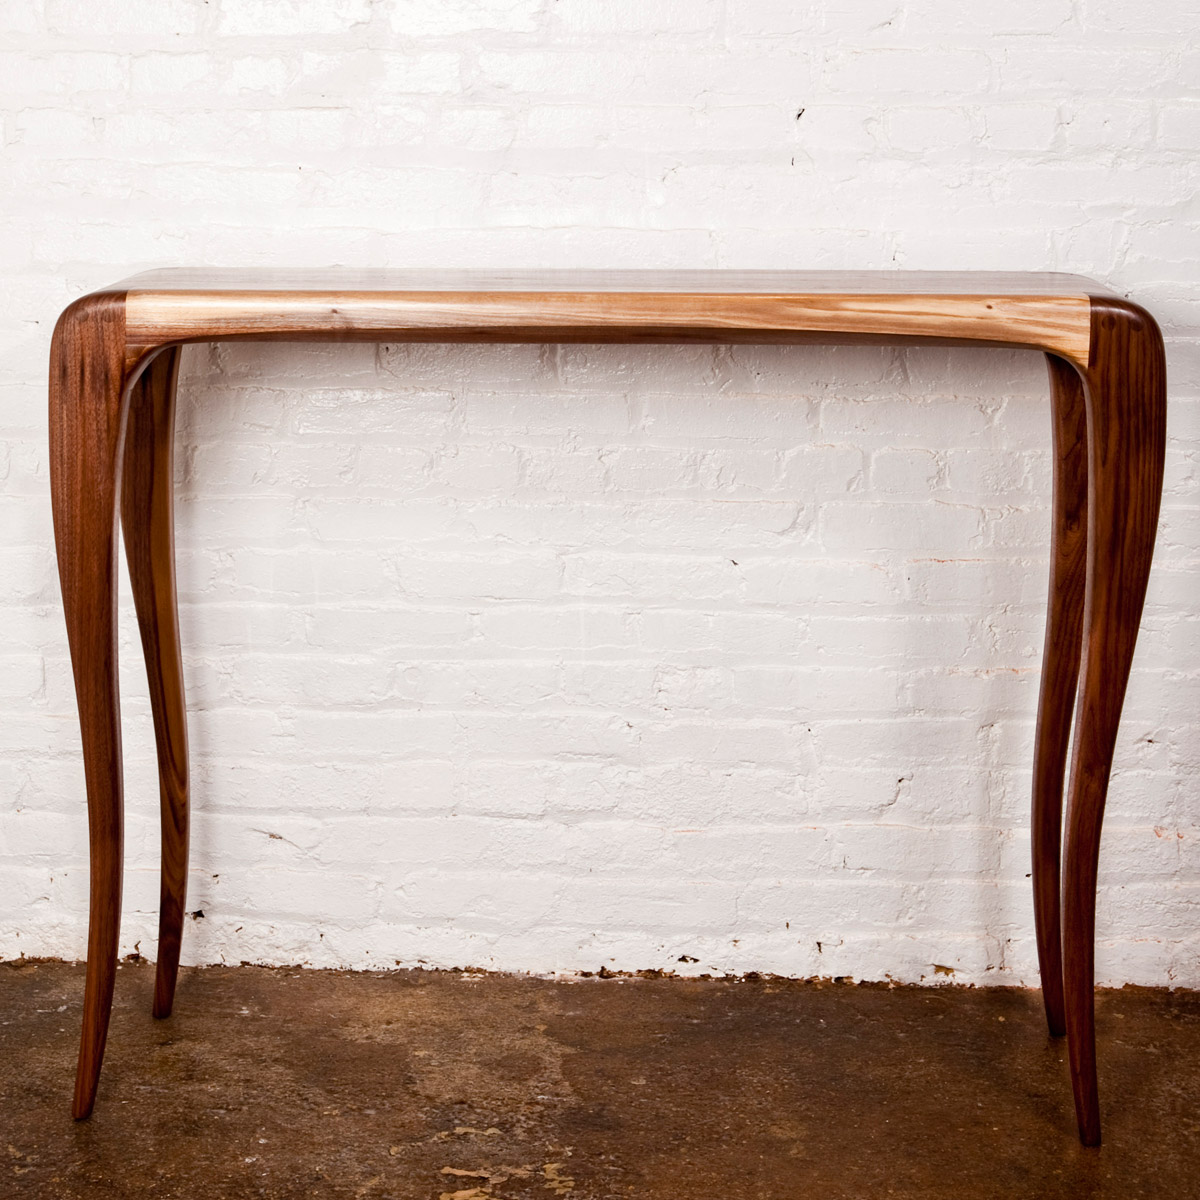 Caleb-Woodard-Hayworth-Side-Table_1.jpg